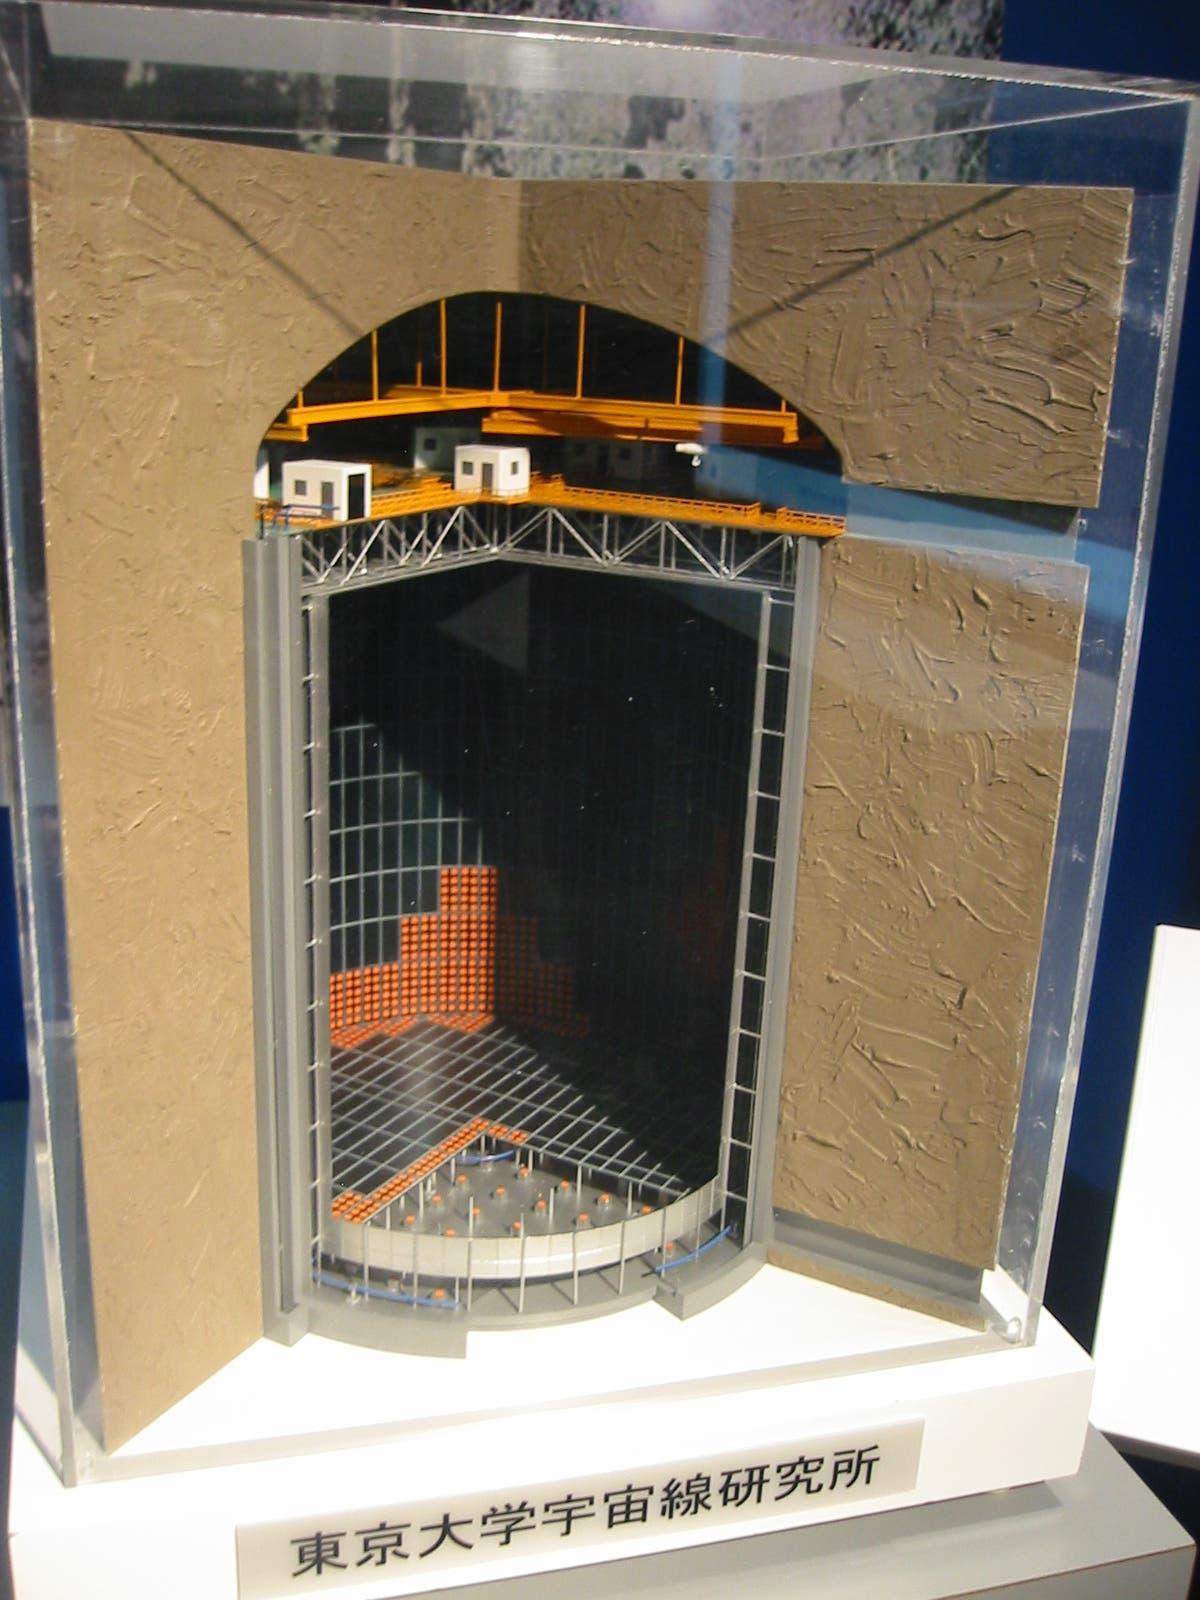 Modell des Kamiokande-Neutrinodetektors